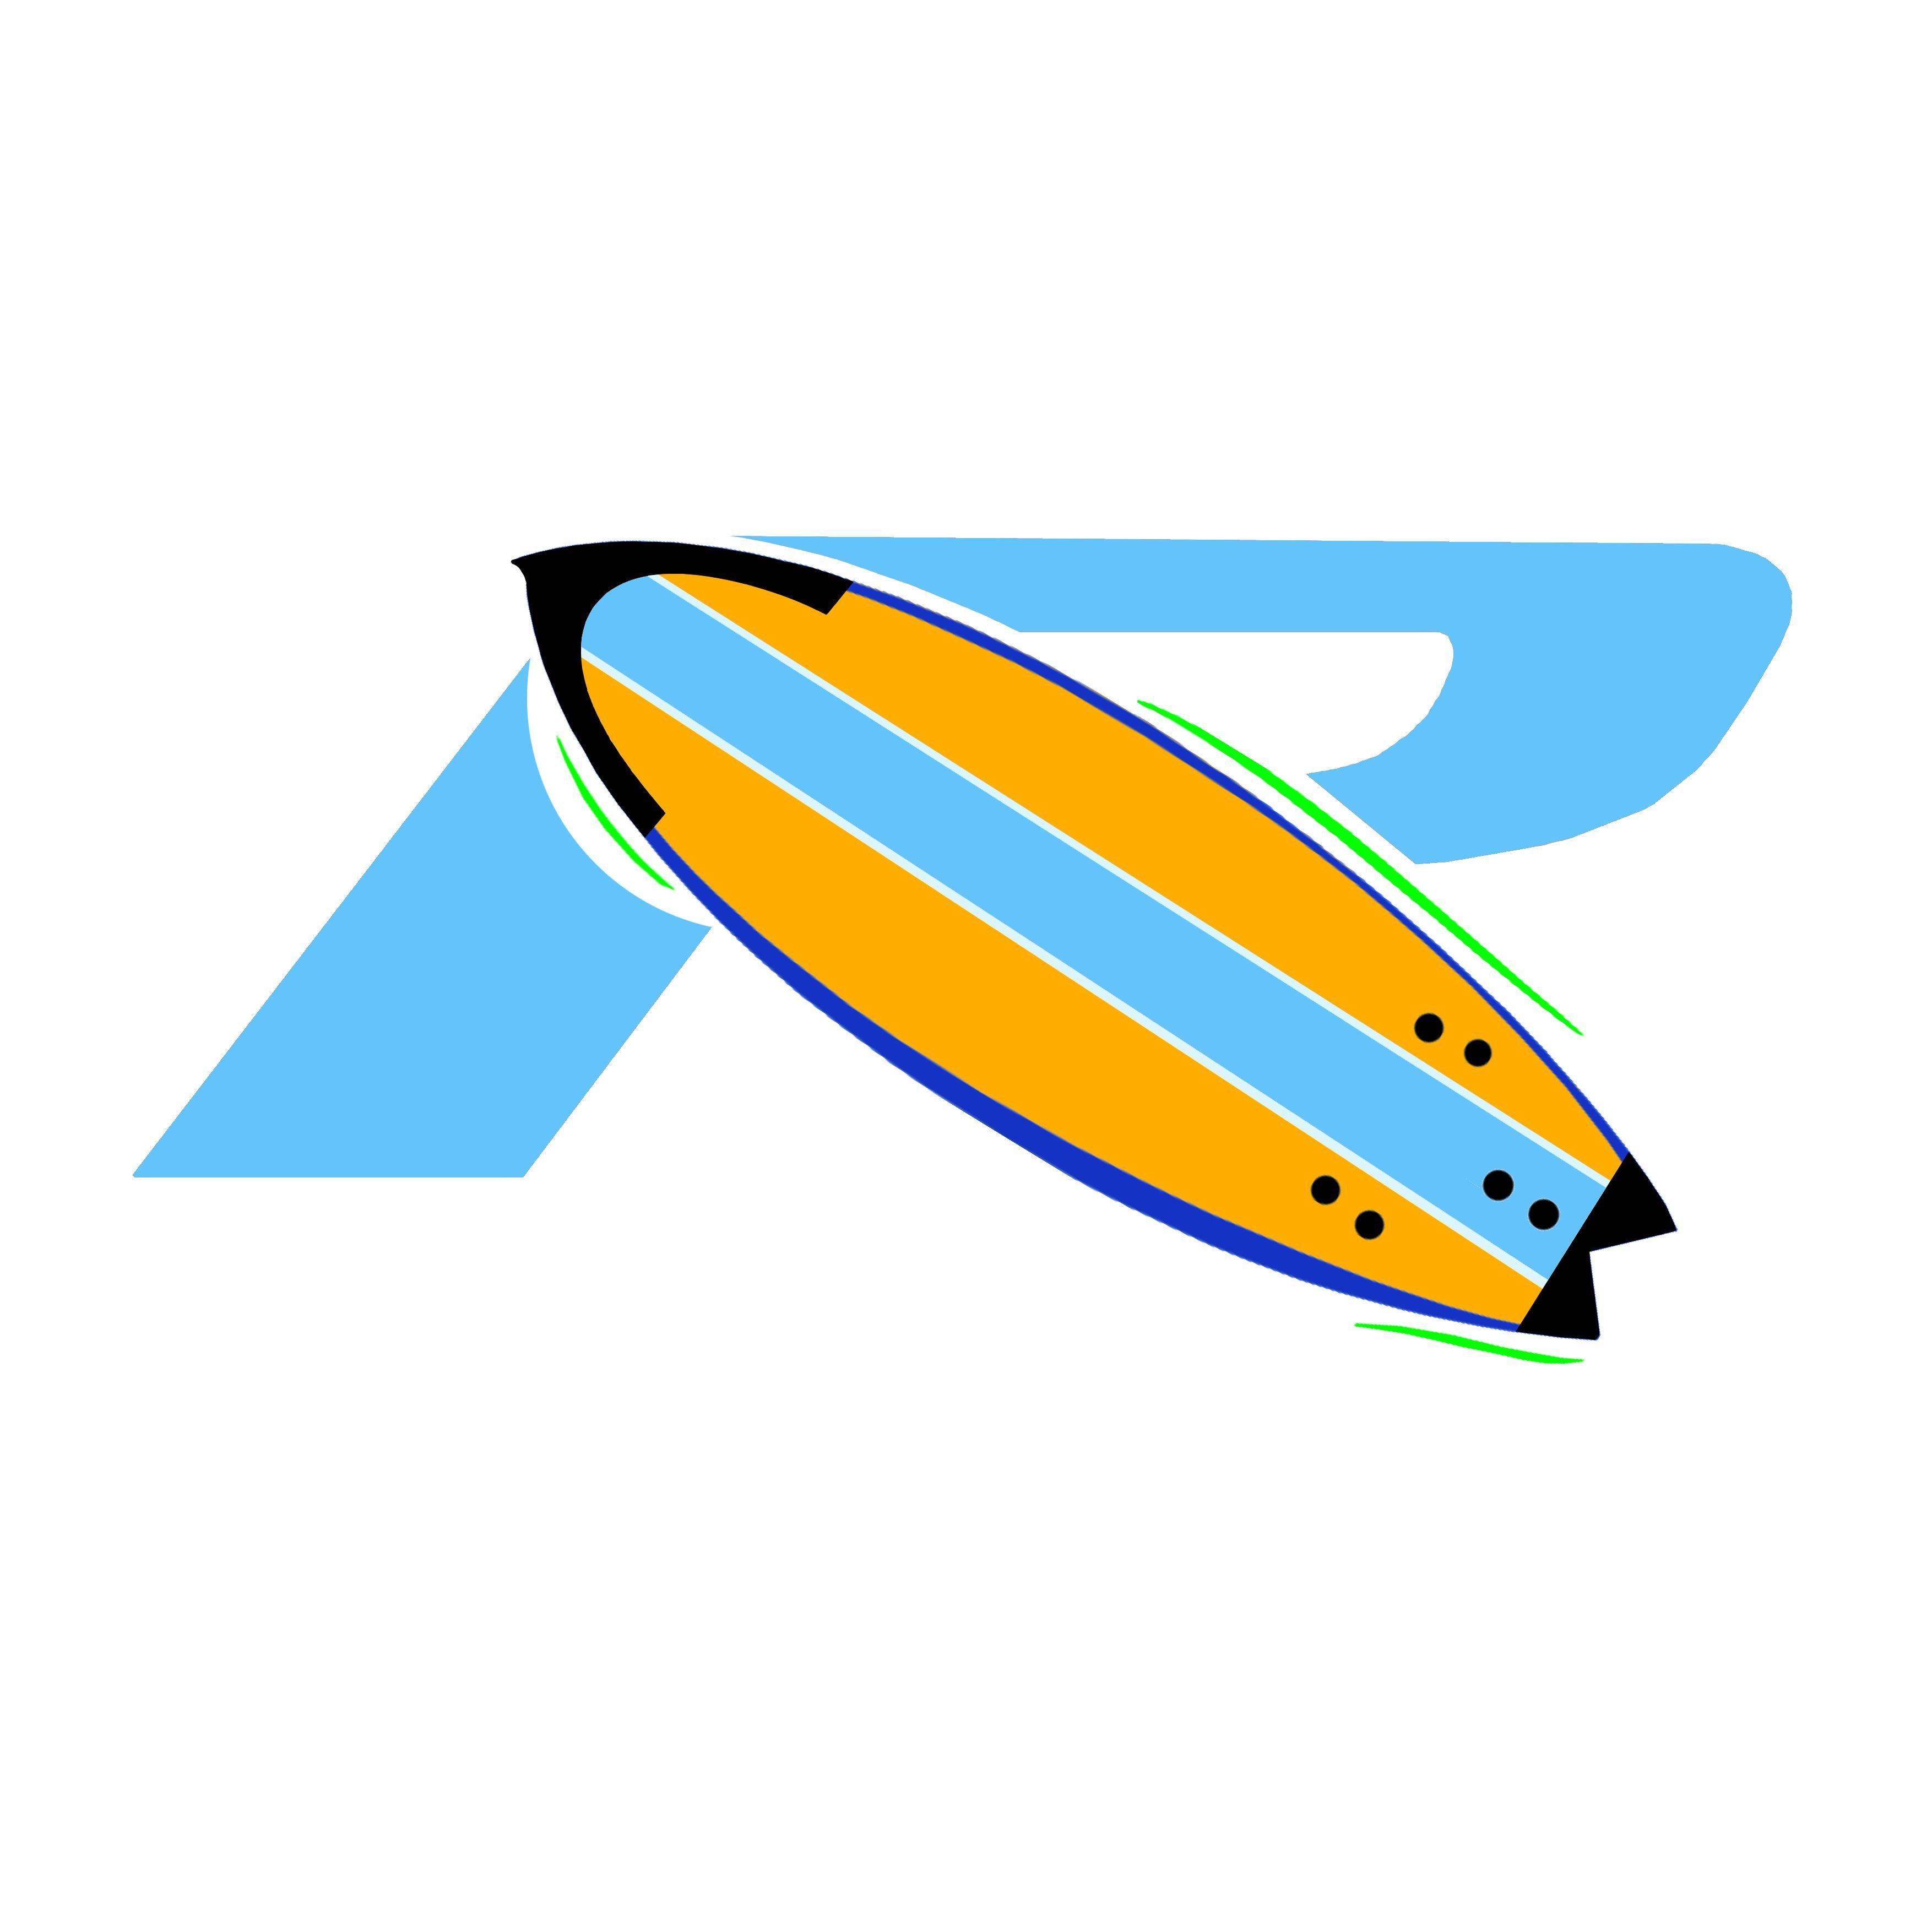 Rob Surf Logo Surf logo, Logos design, Logos